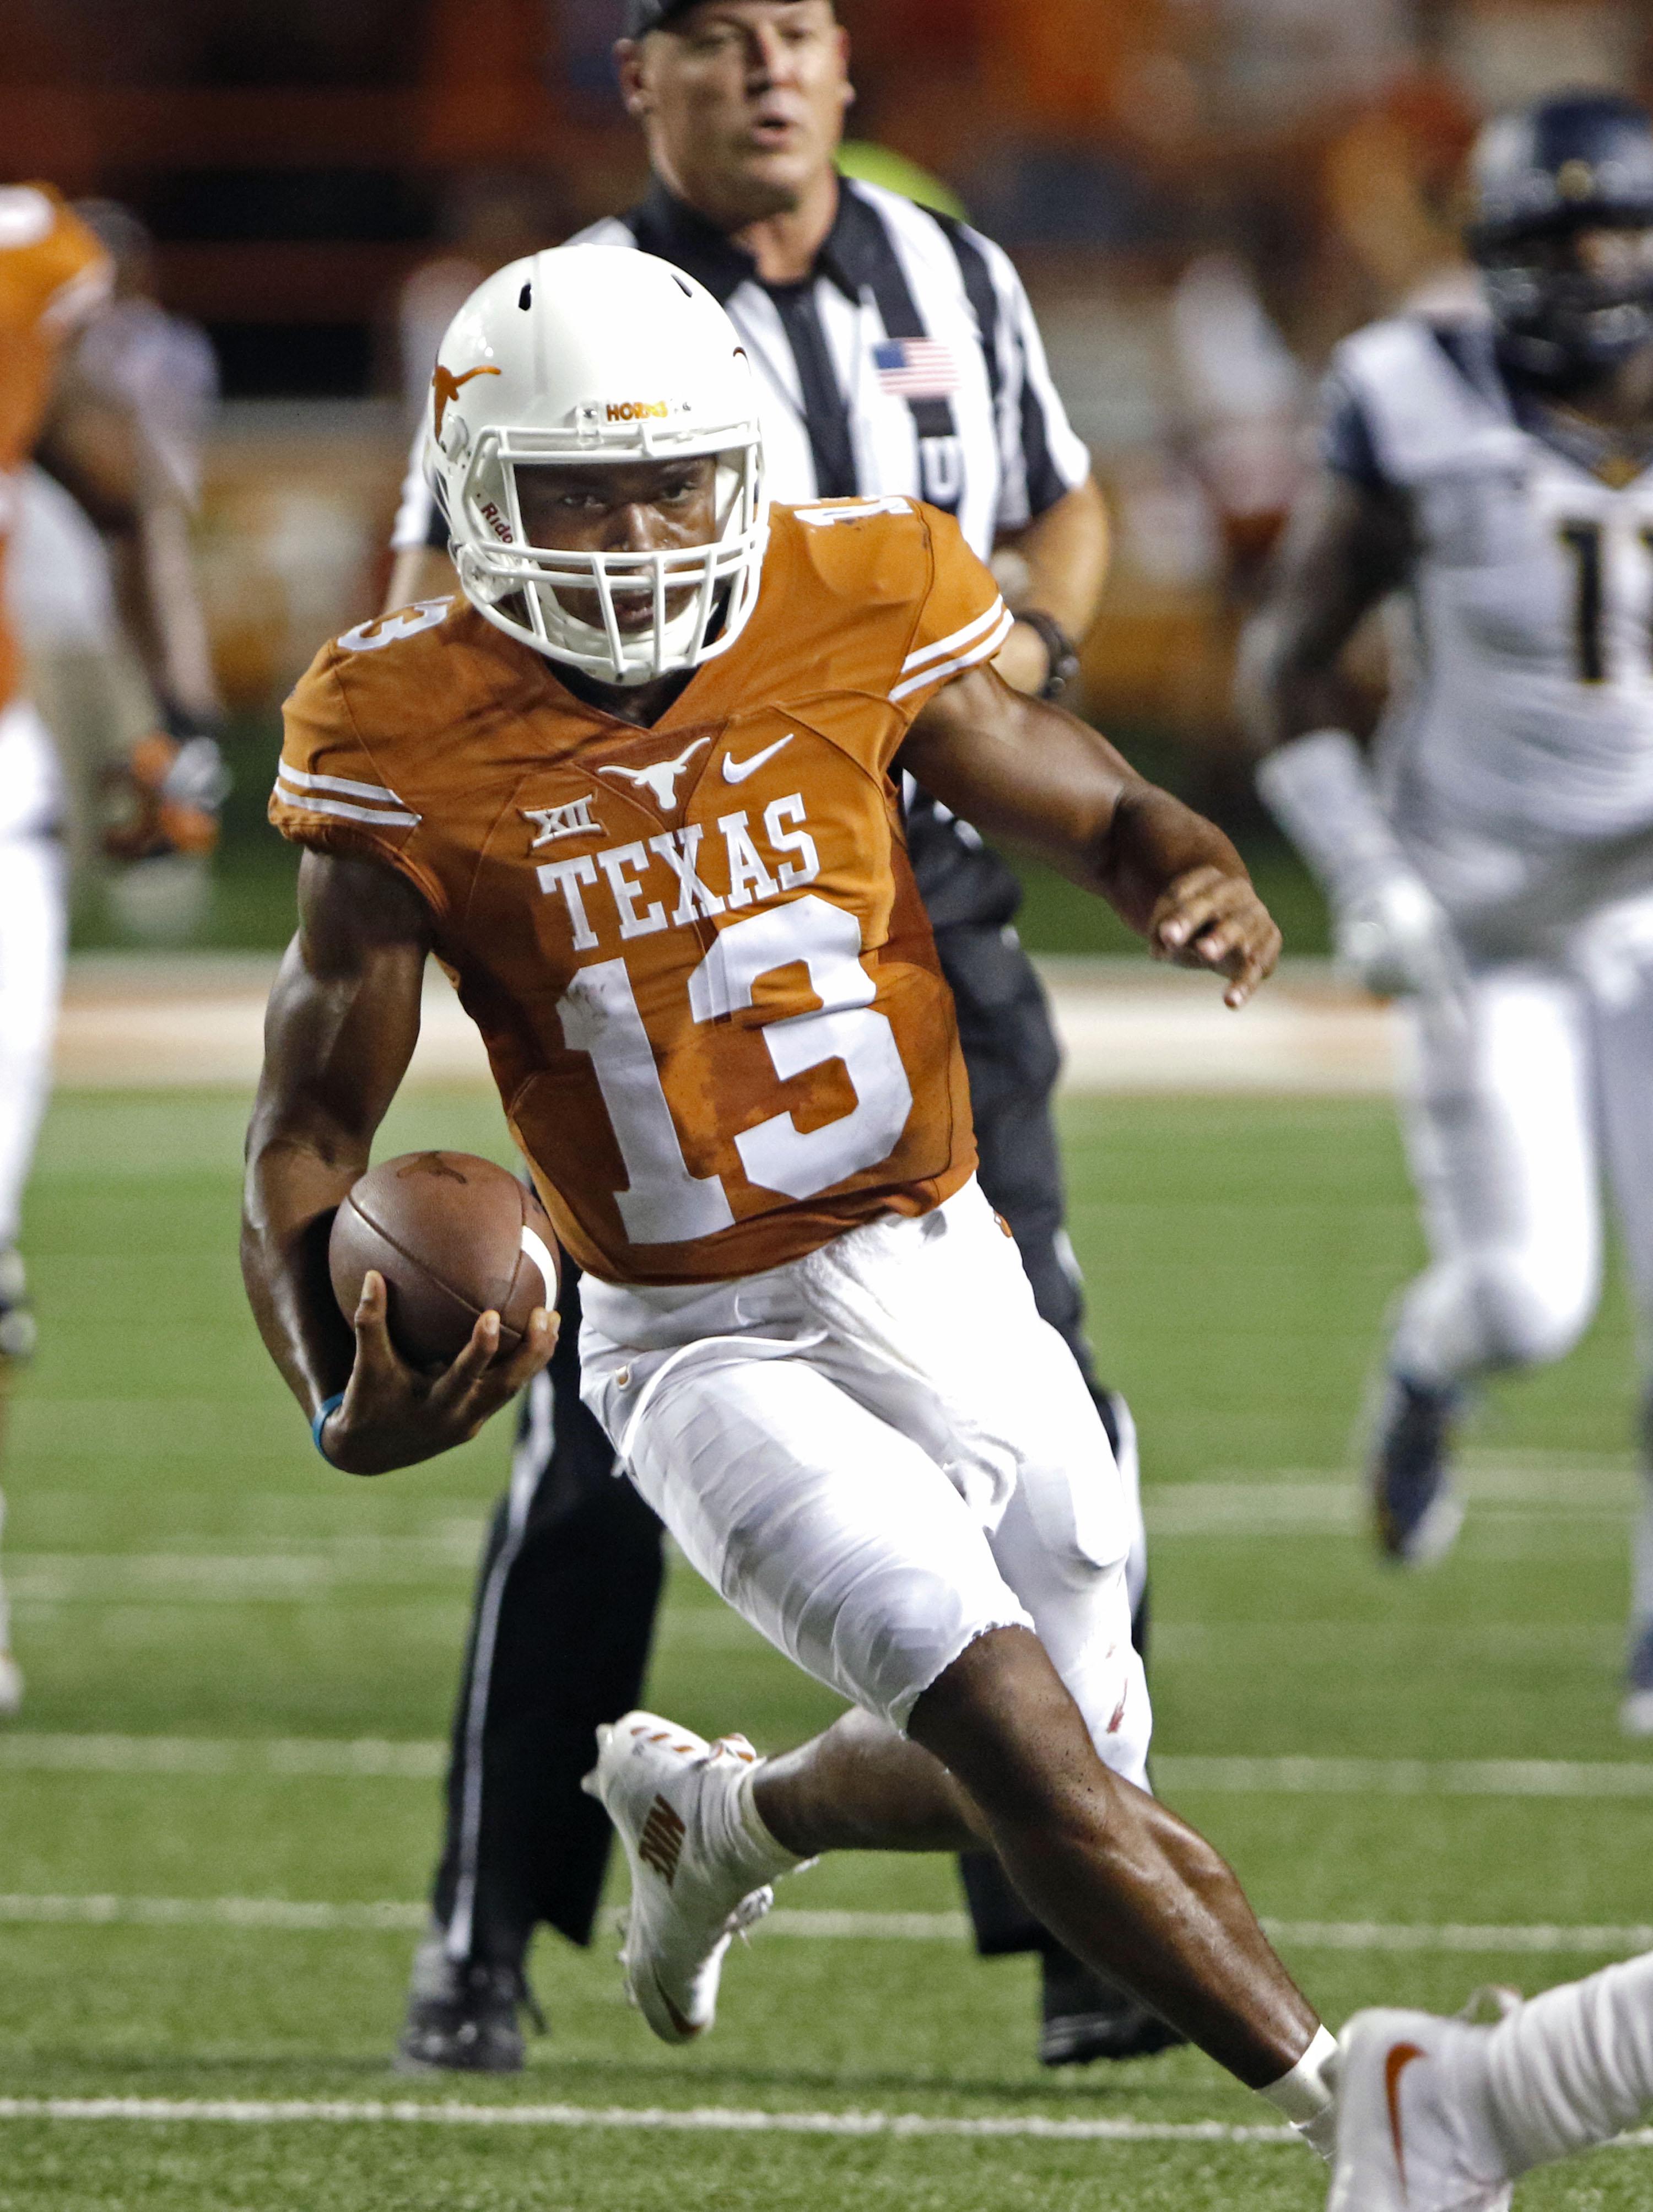 Texas quarterback Jerrod Heard (13) runs for a touchdown during the second half of an NCAA college football game against California, Saturday, Sept. 19, 2015, in Austin, Texas. (AP Photo/Michael Thomas)